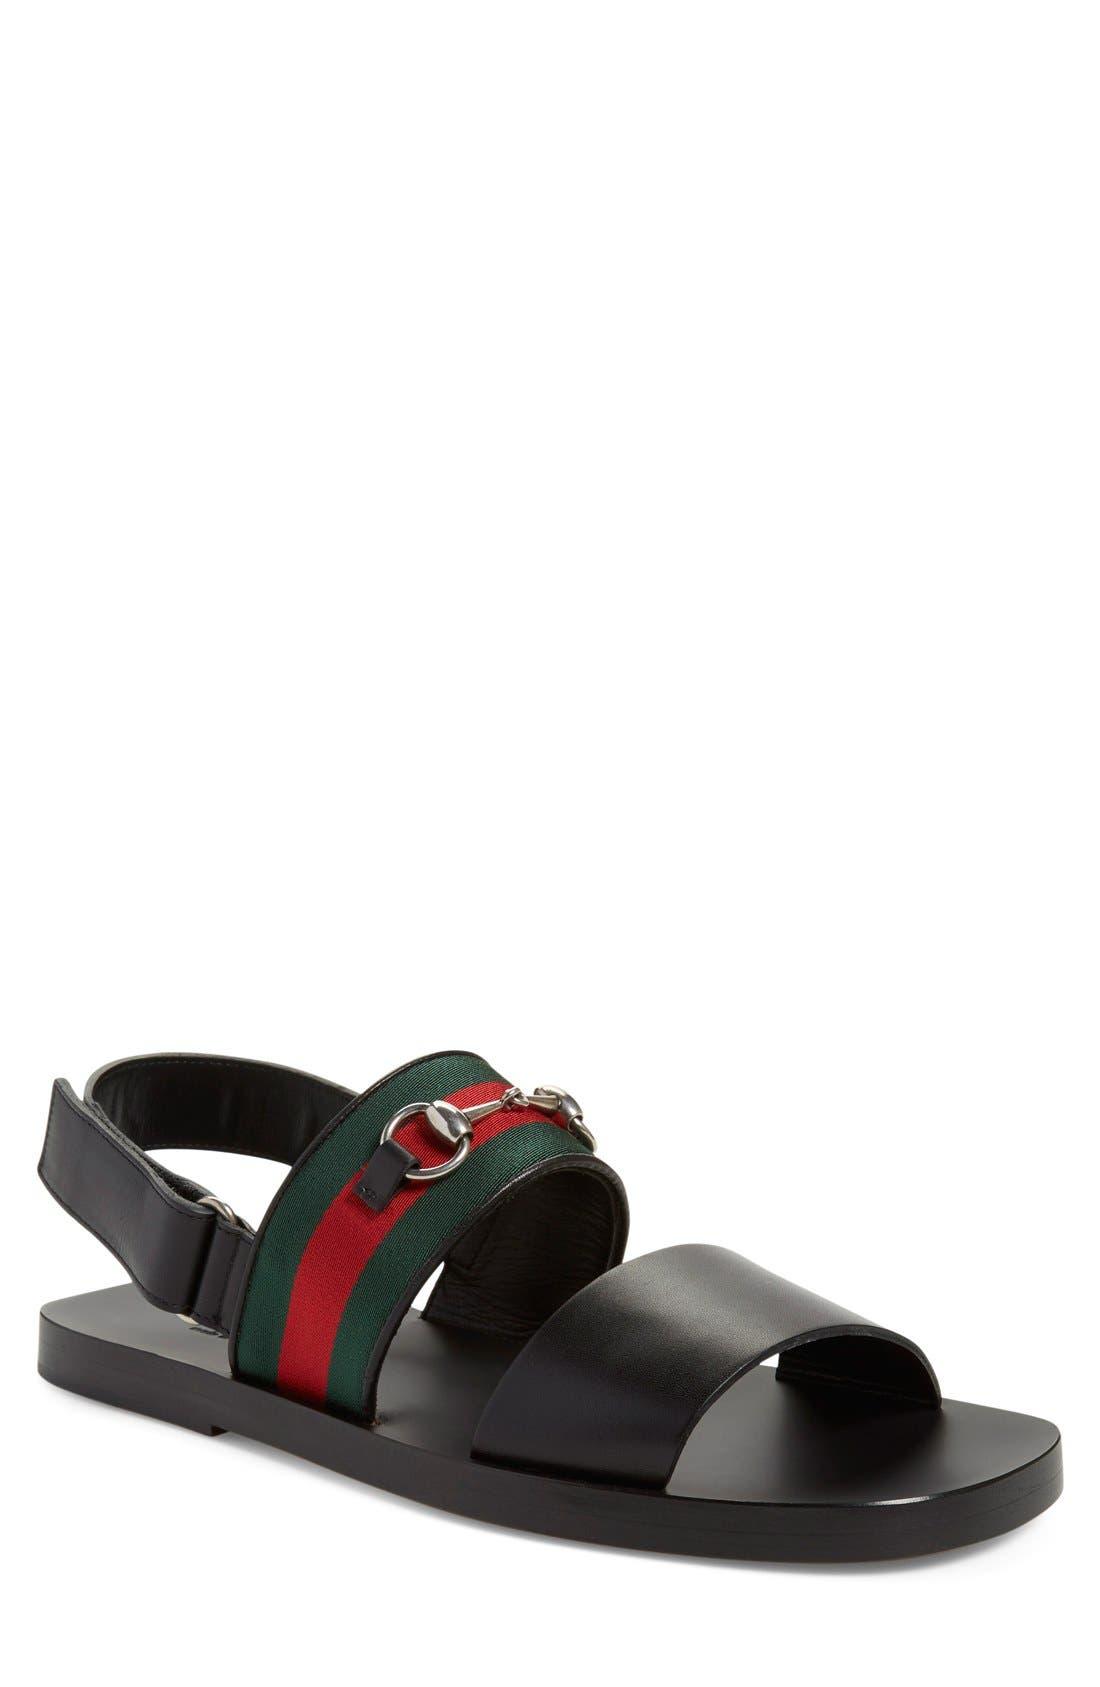 Main Image - Gucci 'Twelve Strap' Sandal (Men)